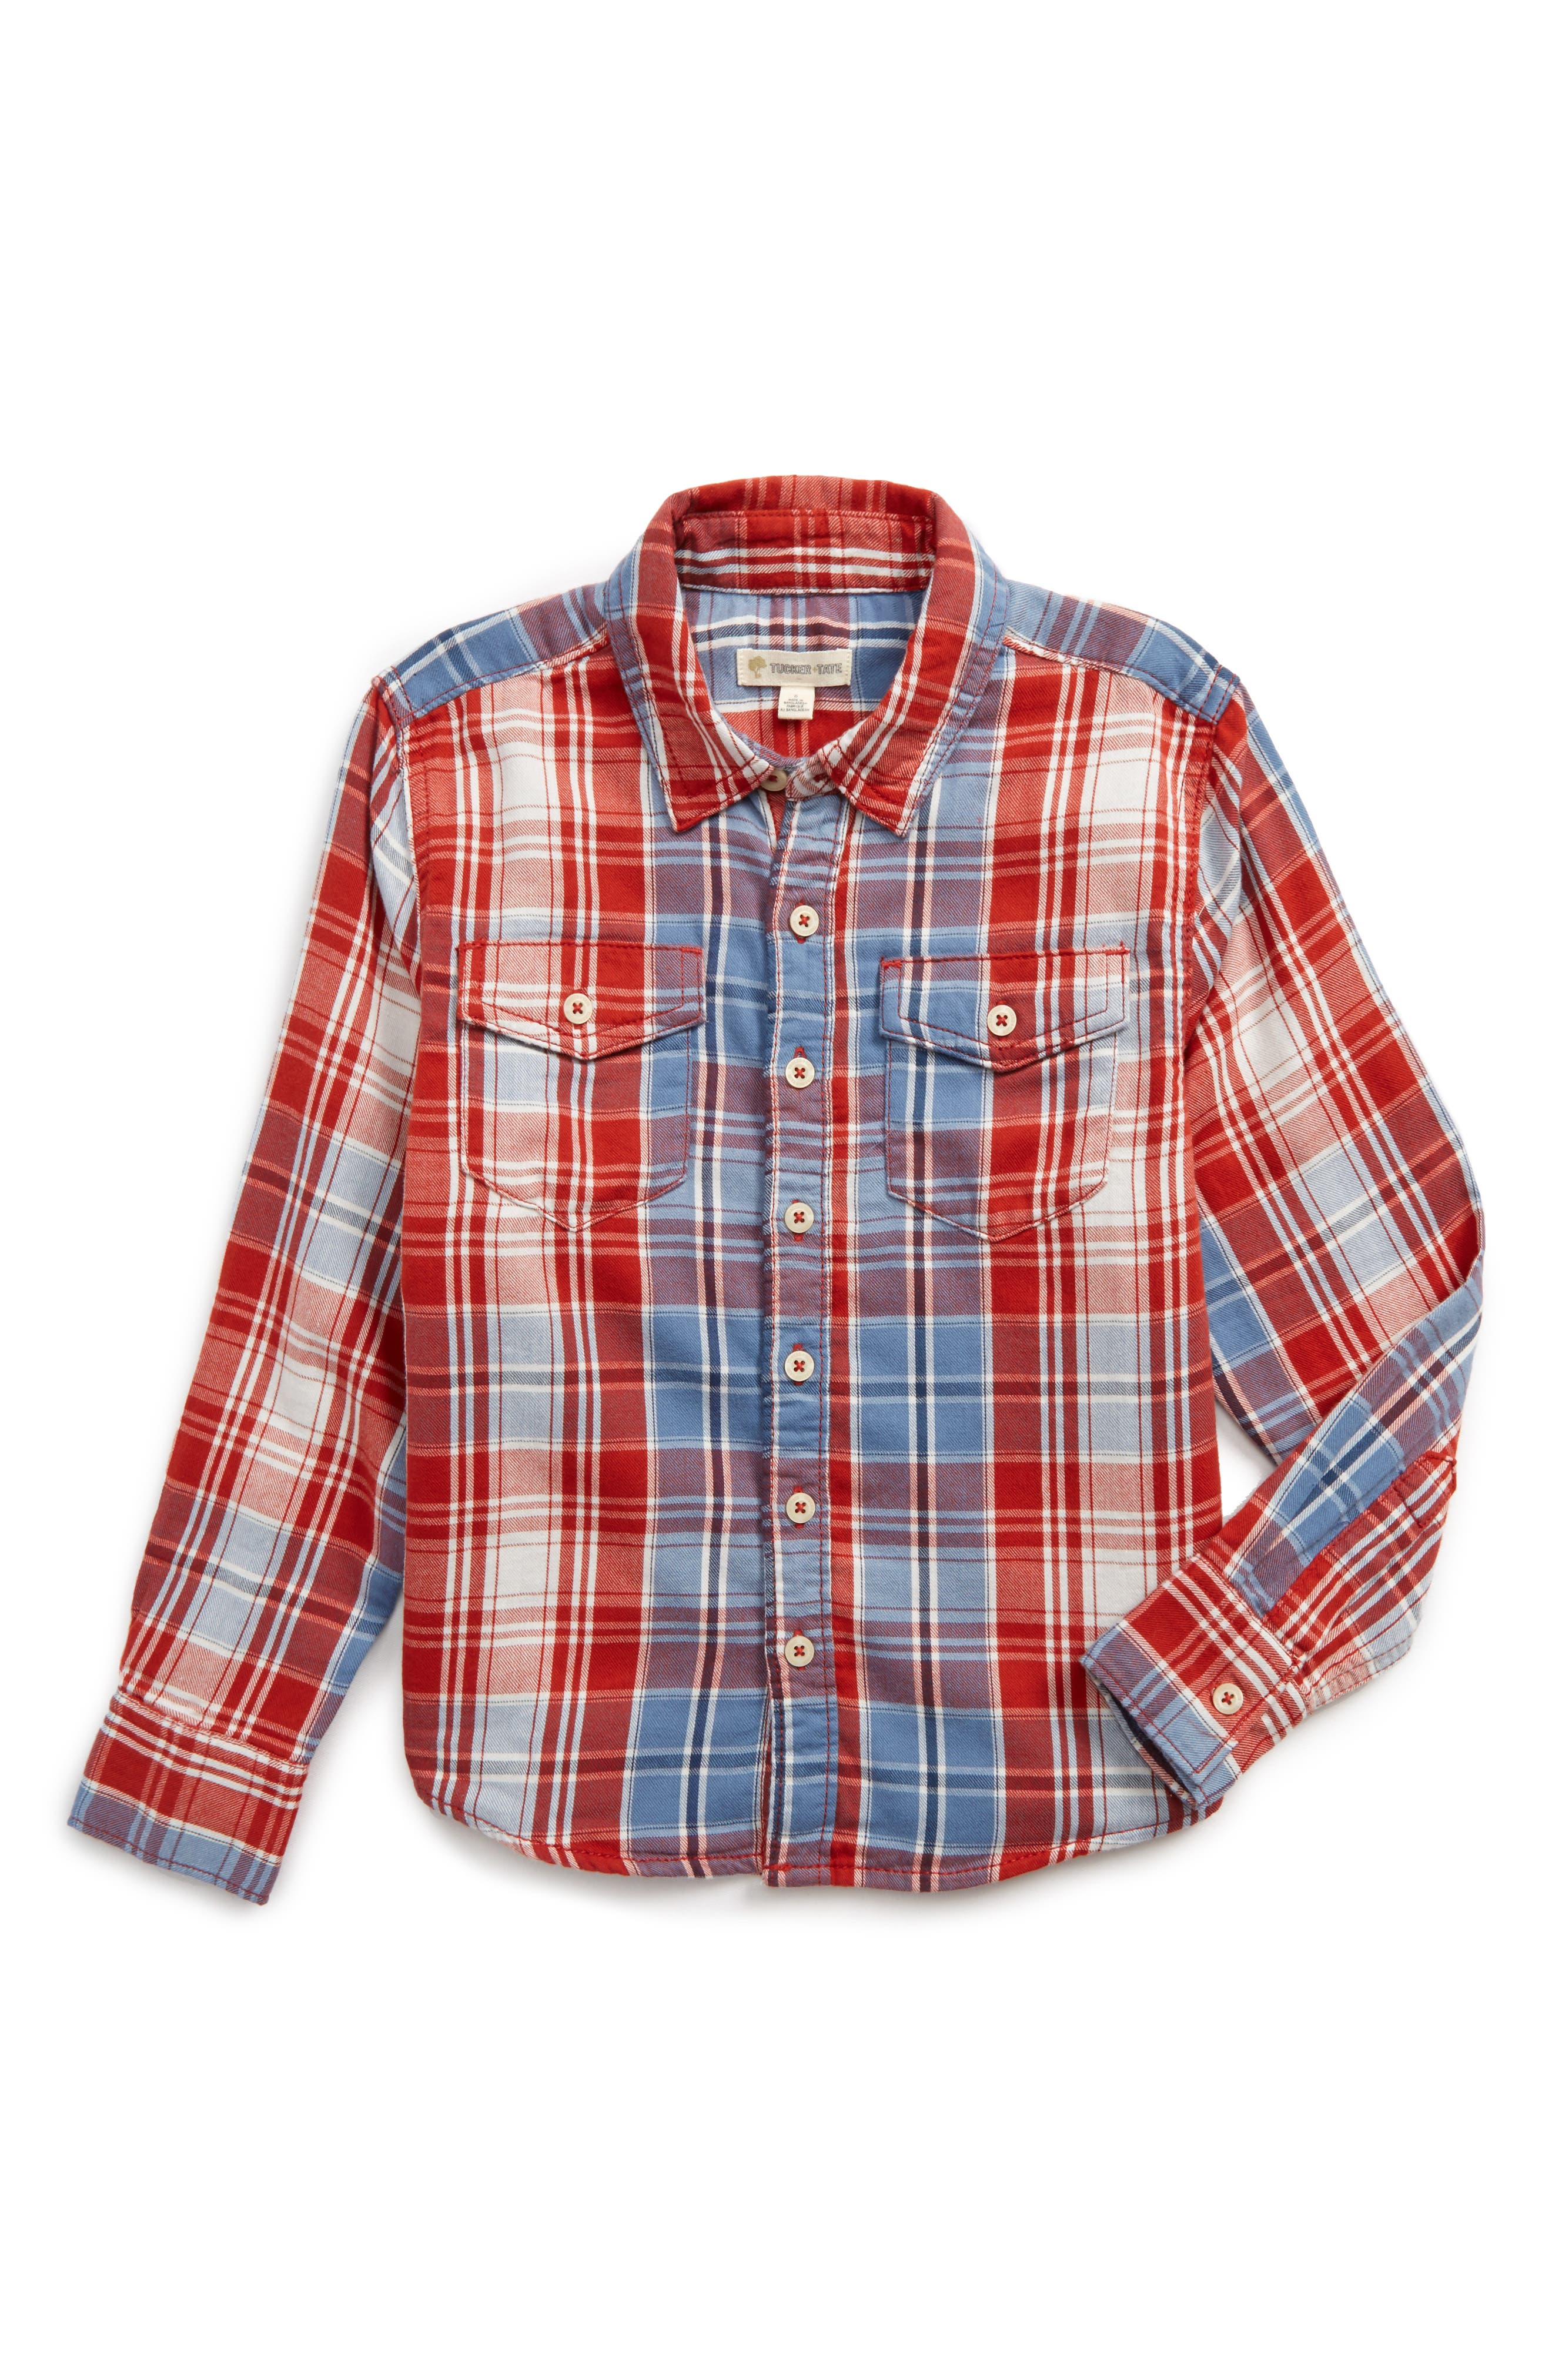 Main Image - Tucker + Tate Plaid Double Cloth Shirt (Toddler Boys & Little Boys)